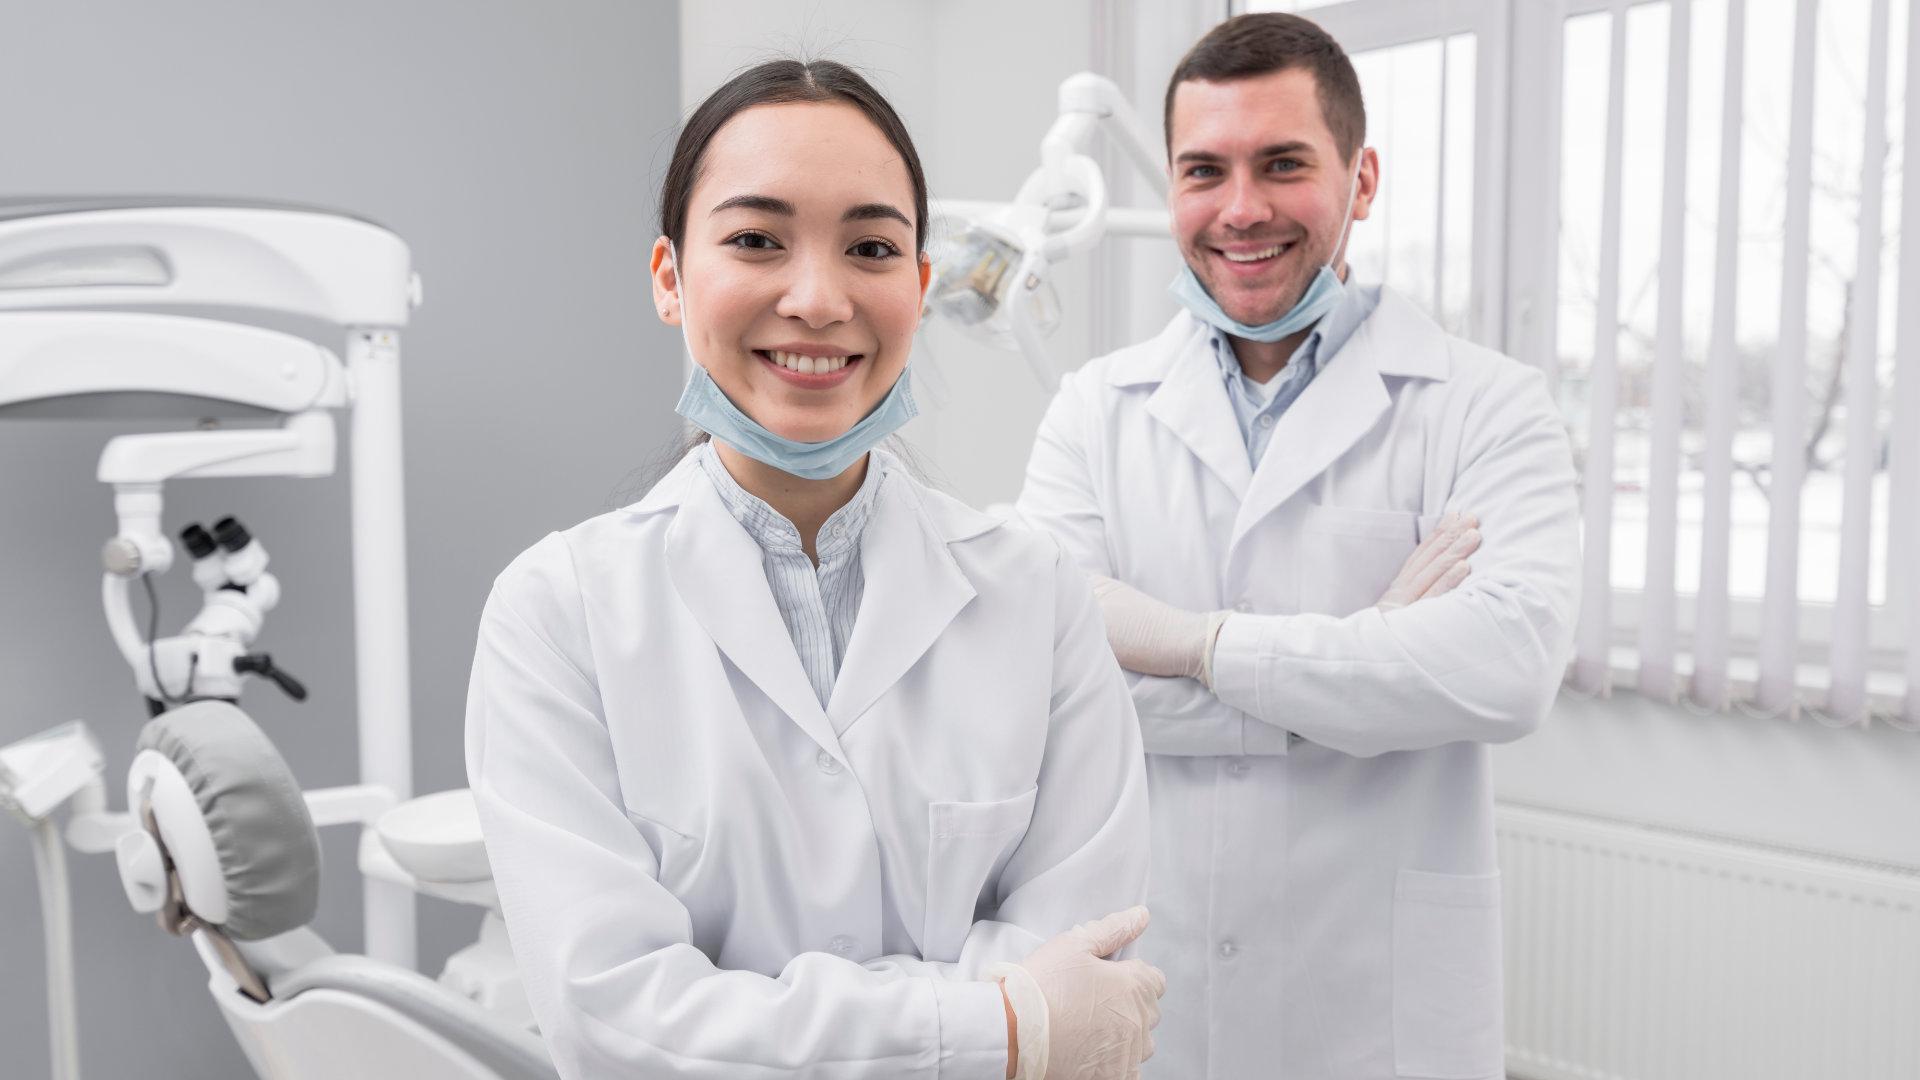 https://www.sorridibene.it/wp-content/uploads/2019/12/cura-ortodontica.jpg